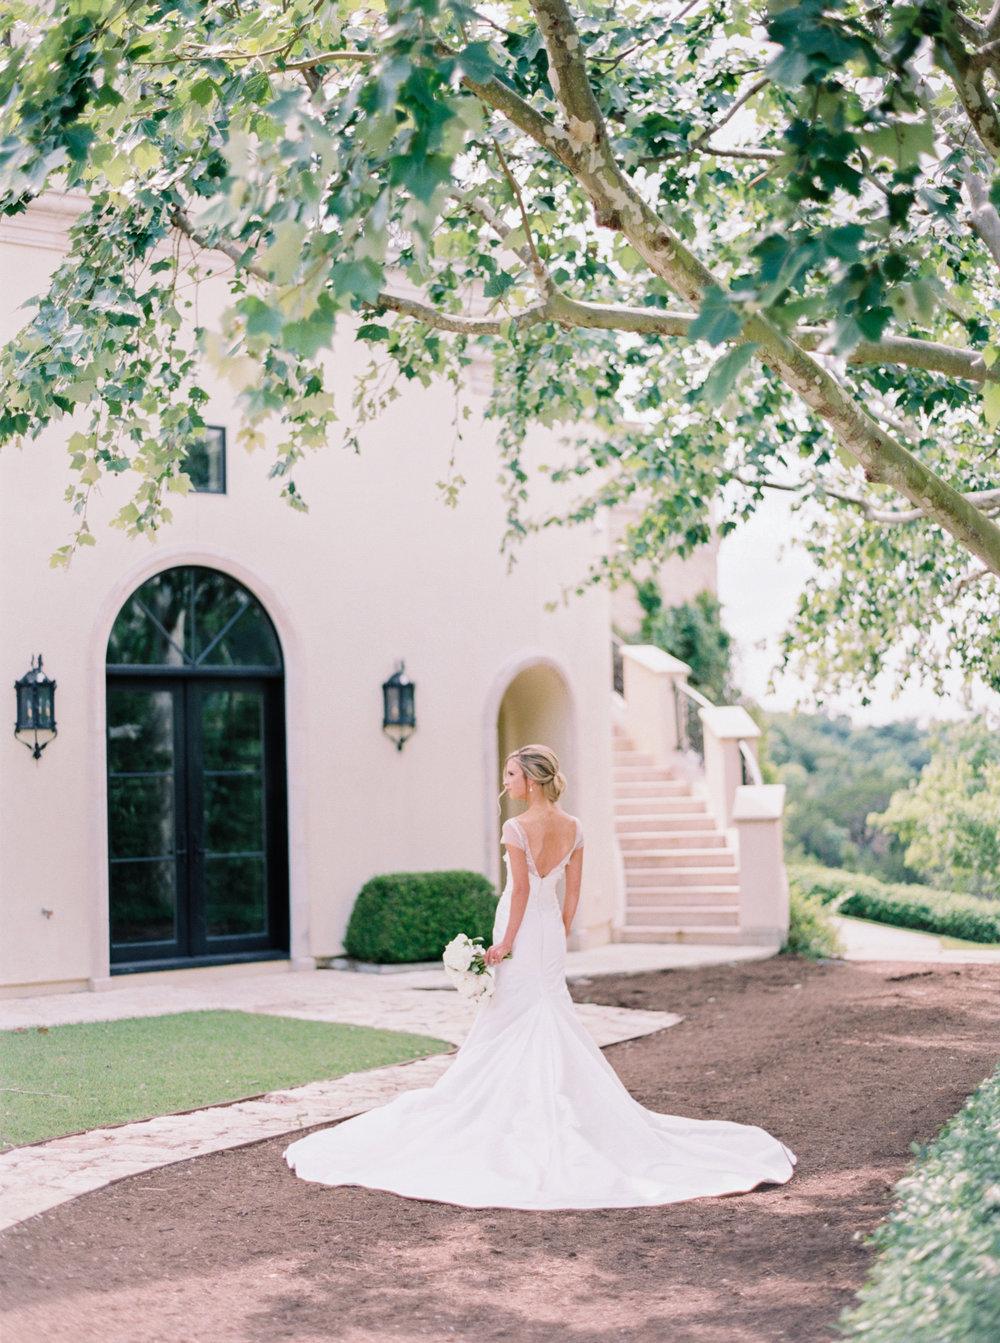 jenna-mcelroy-bridal-portraits-a-southern-tradition-6